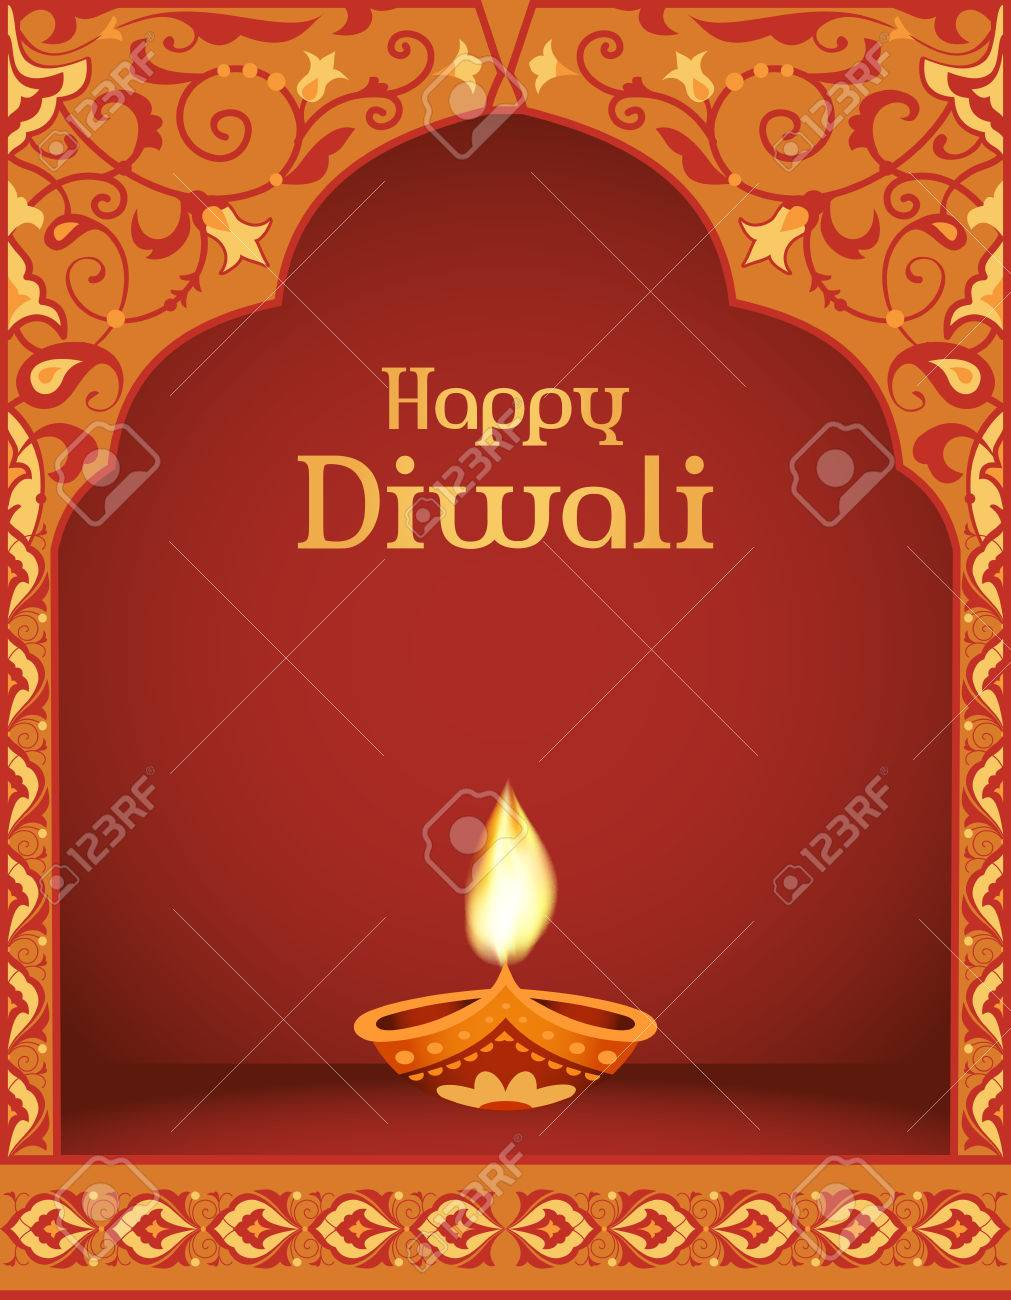 Happy diwali traditional indian festival greeting card design happy diwali traditional indian festival greeting card design stock vector 63424590 m4hsunfo